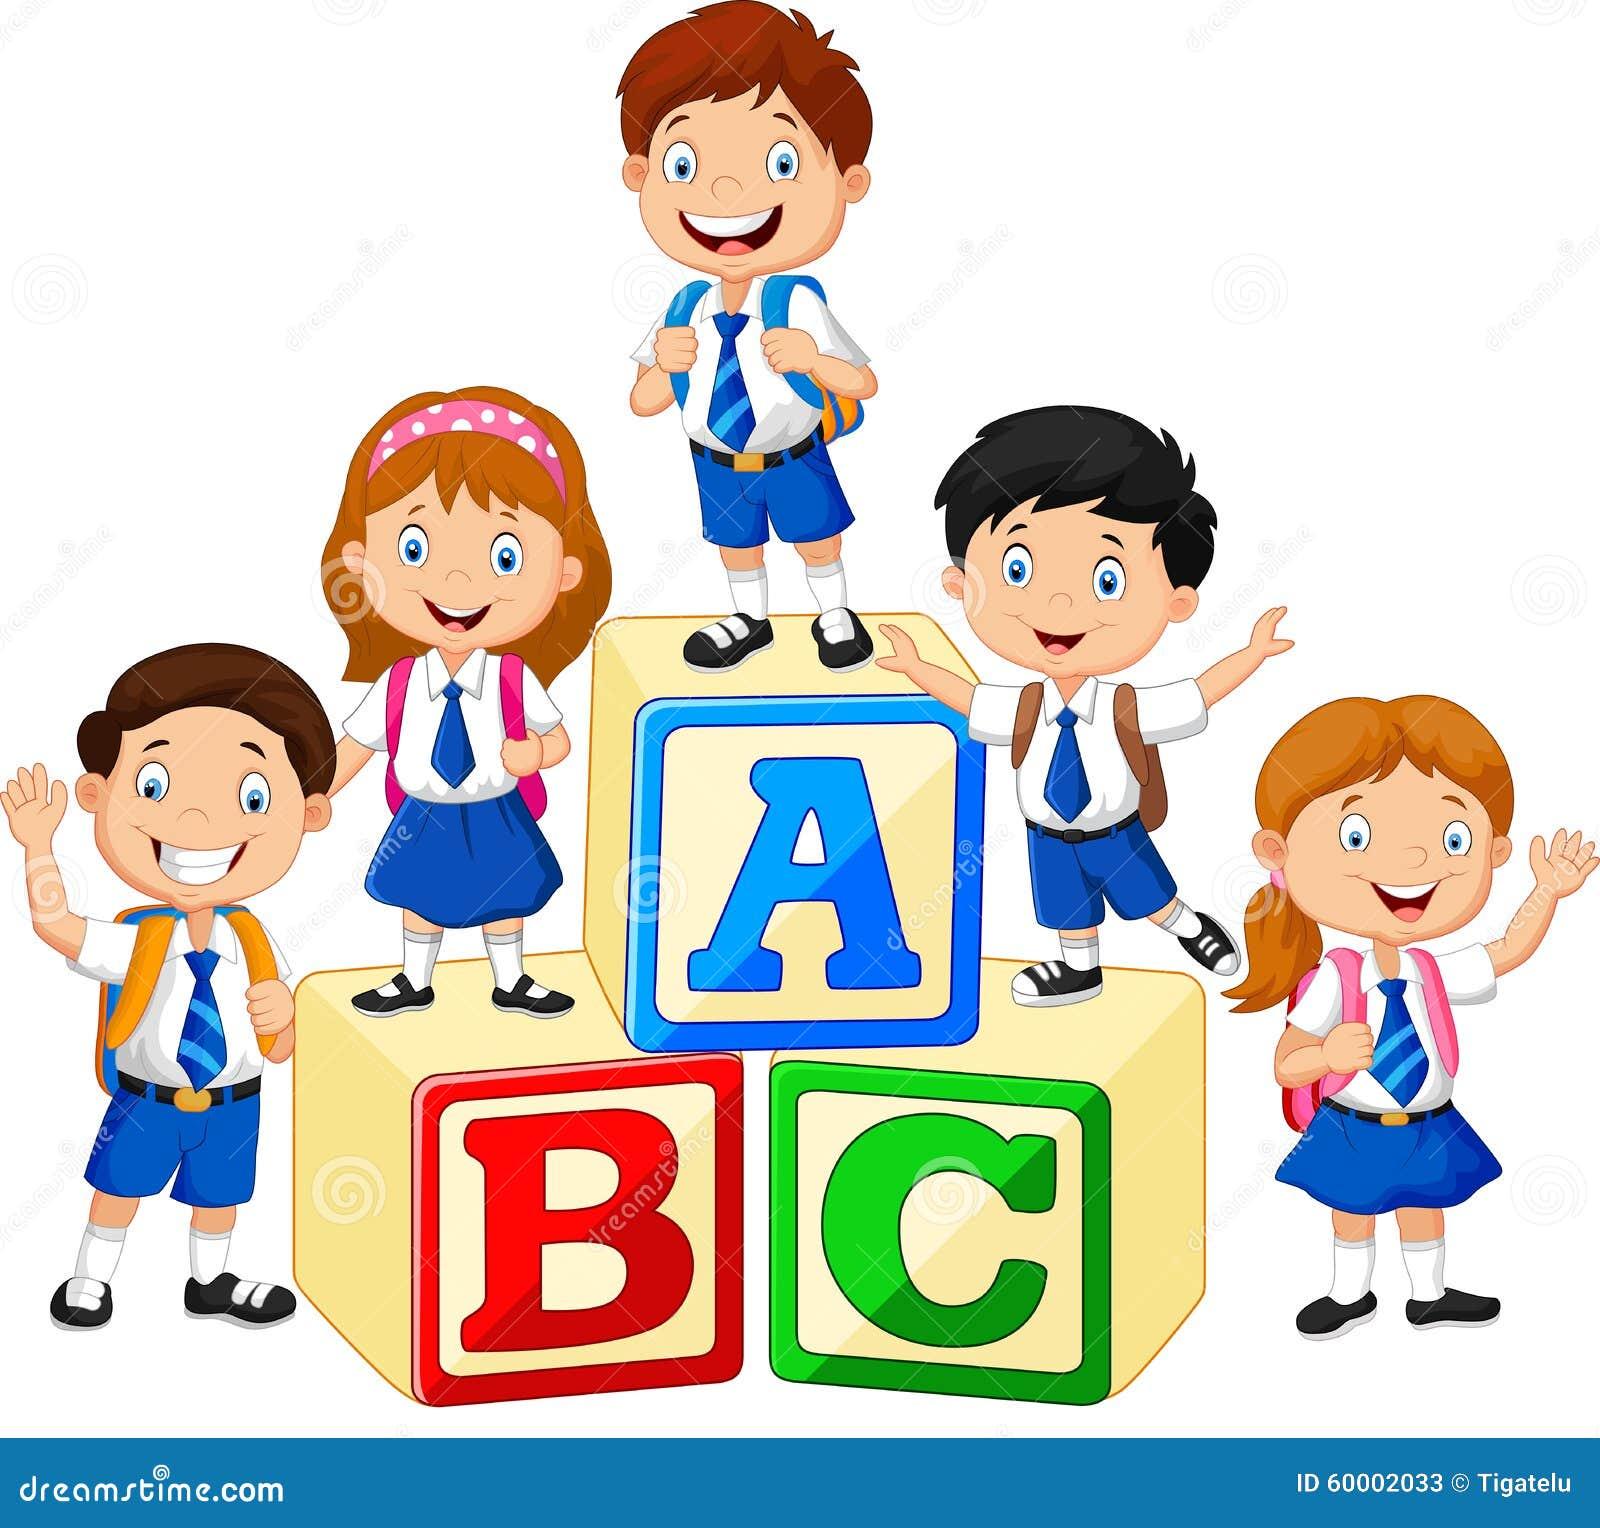 Stock Illustration Happy School Kids Alphabet Blocks Illustration Image60002033 on Kindergarten Math Review